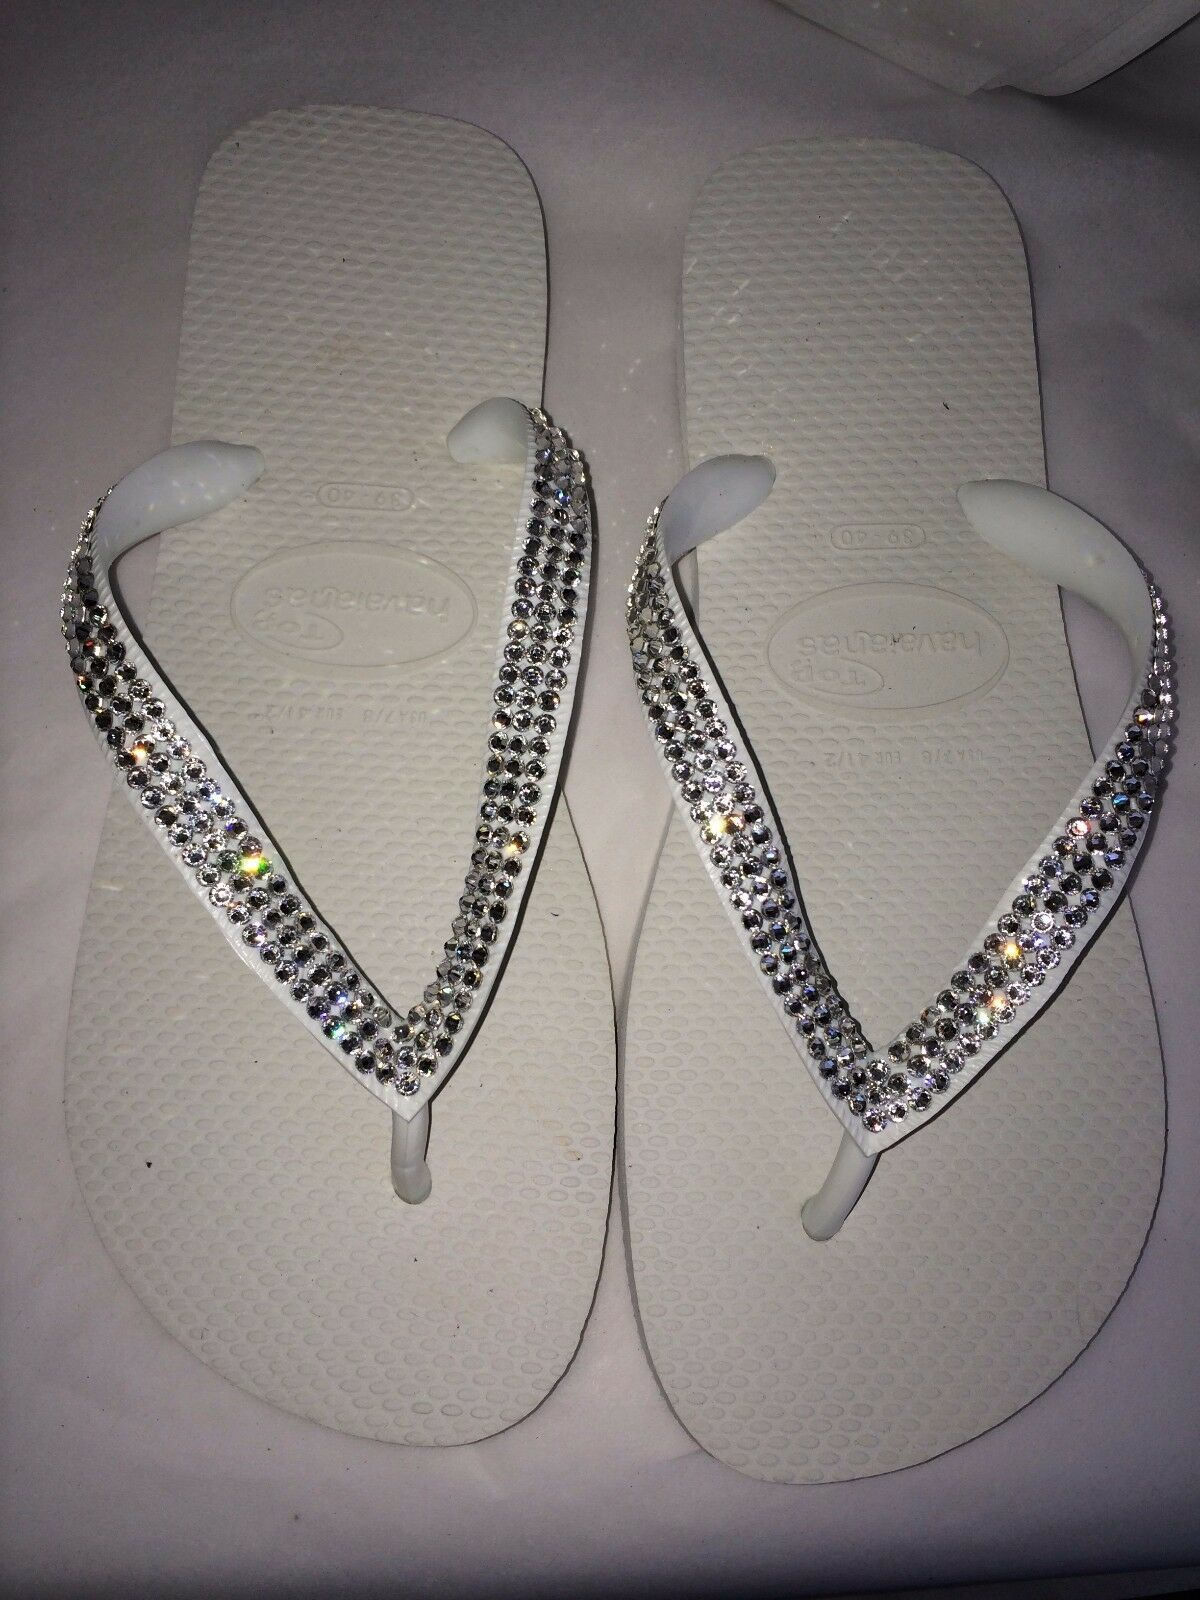 Crystal wedding  flip flops Havaianas made with SWAROVSKI Elements Bling crystal